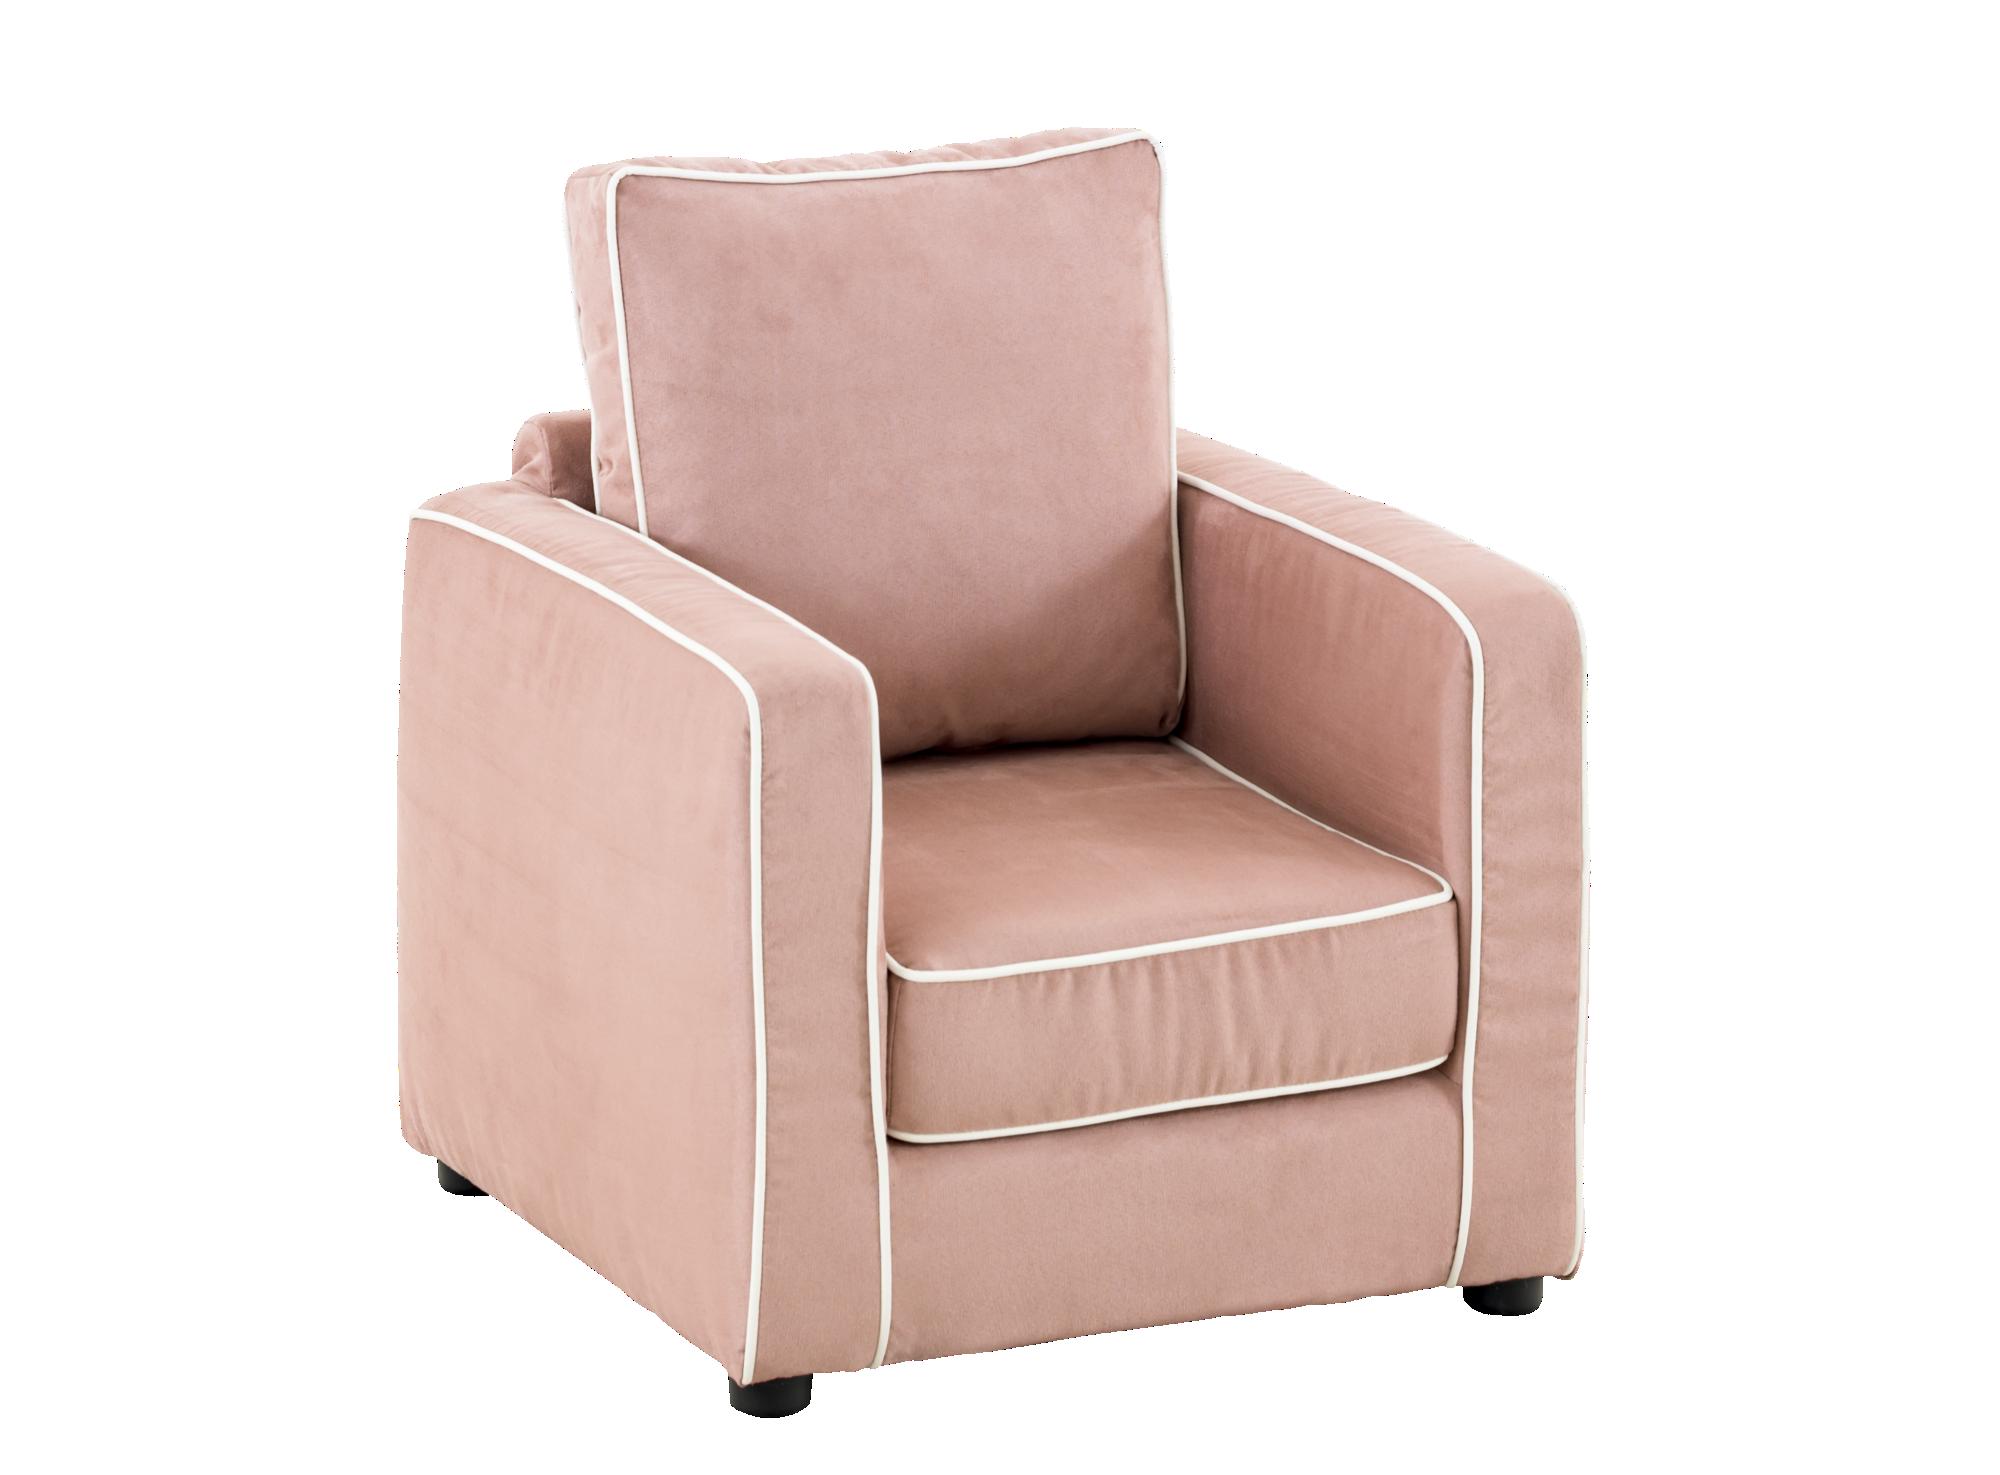 canap modulable pas cher. Black Bedroom Furniture Sets. Home Design Ideas